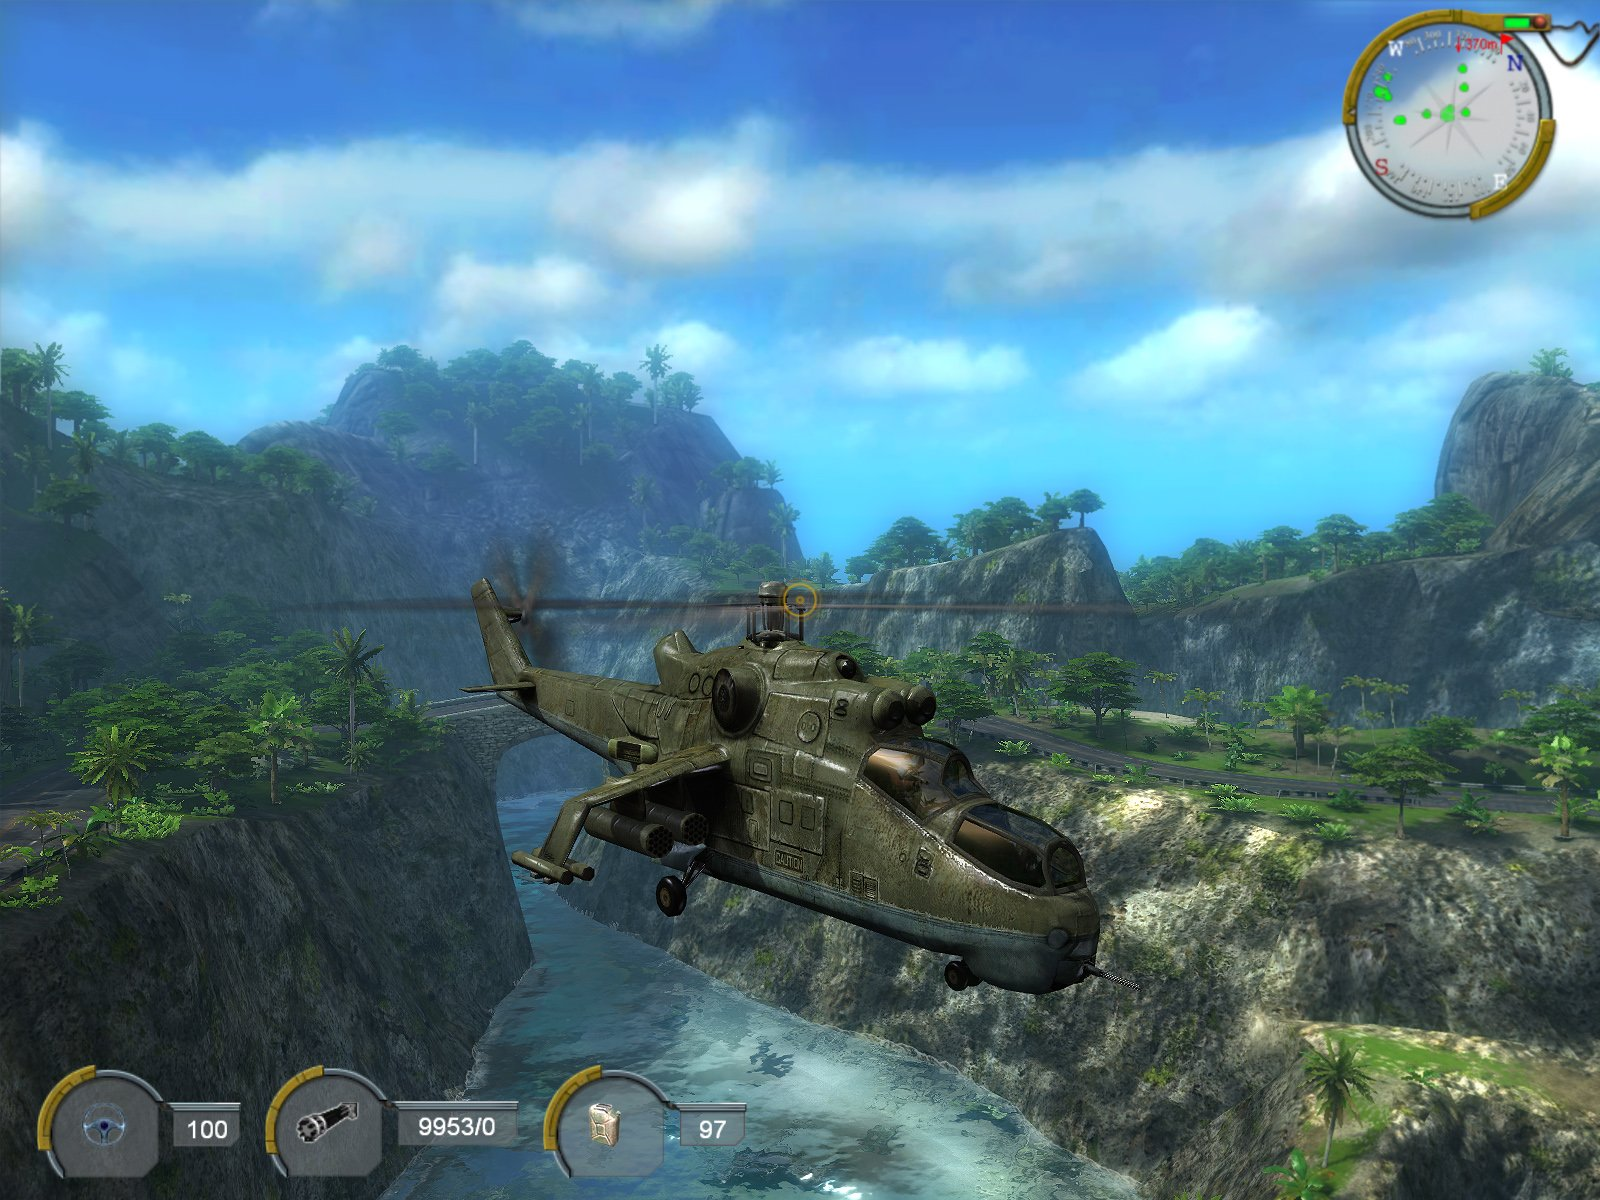 Xenus 2: White Gold - скриншоты и фото игры Xenus 2: White Gold, графика игры. Канобу